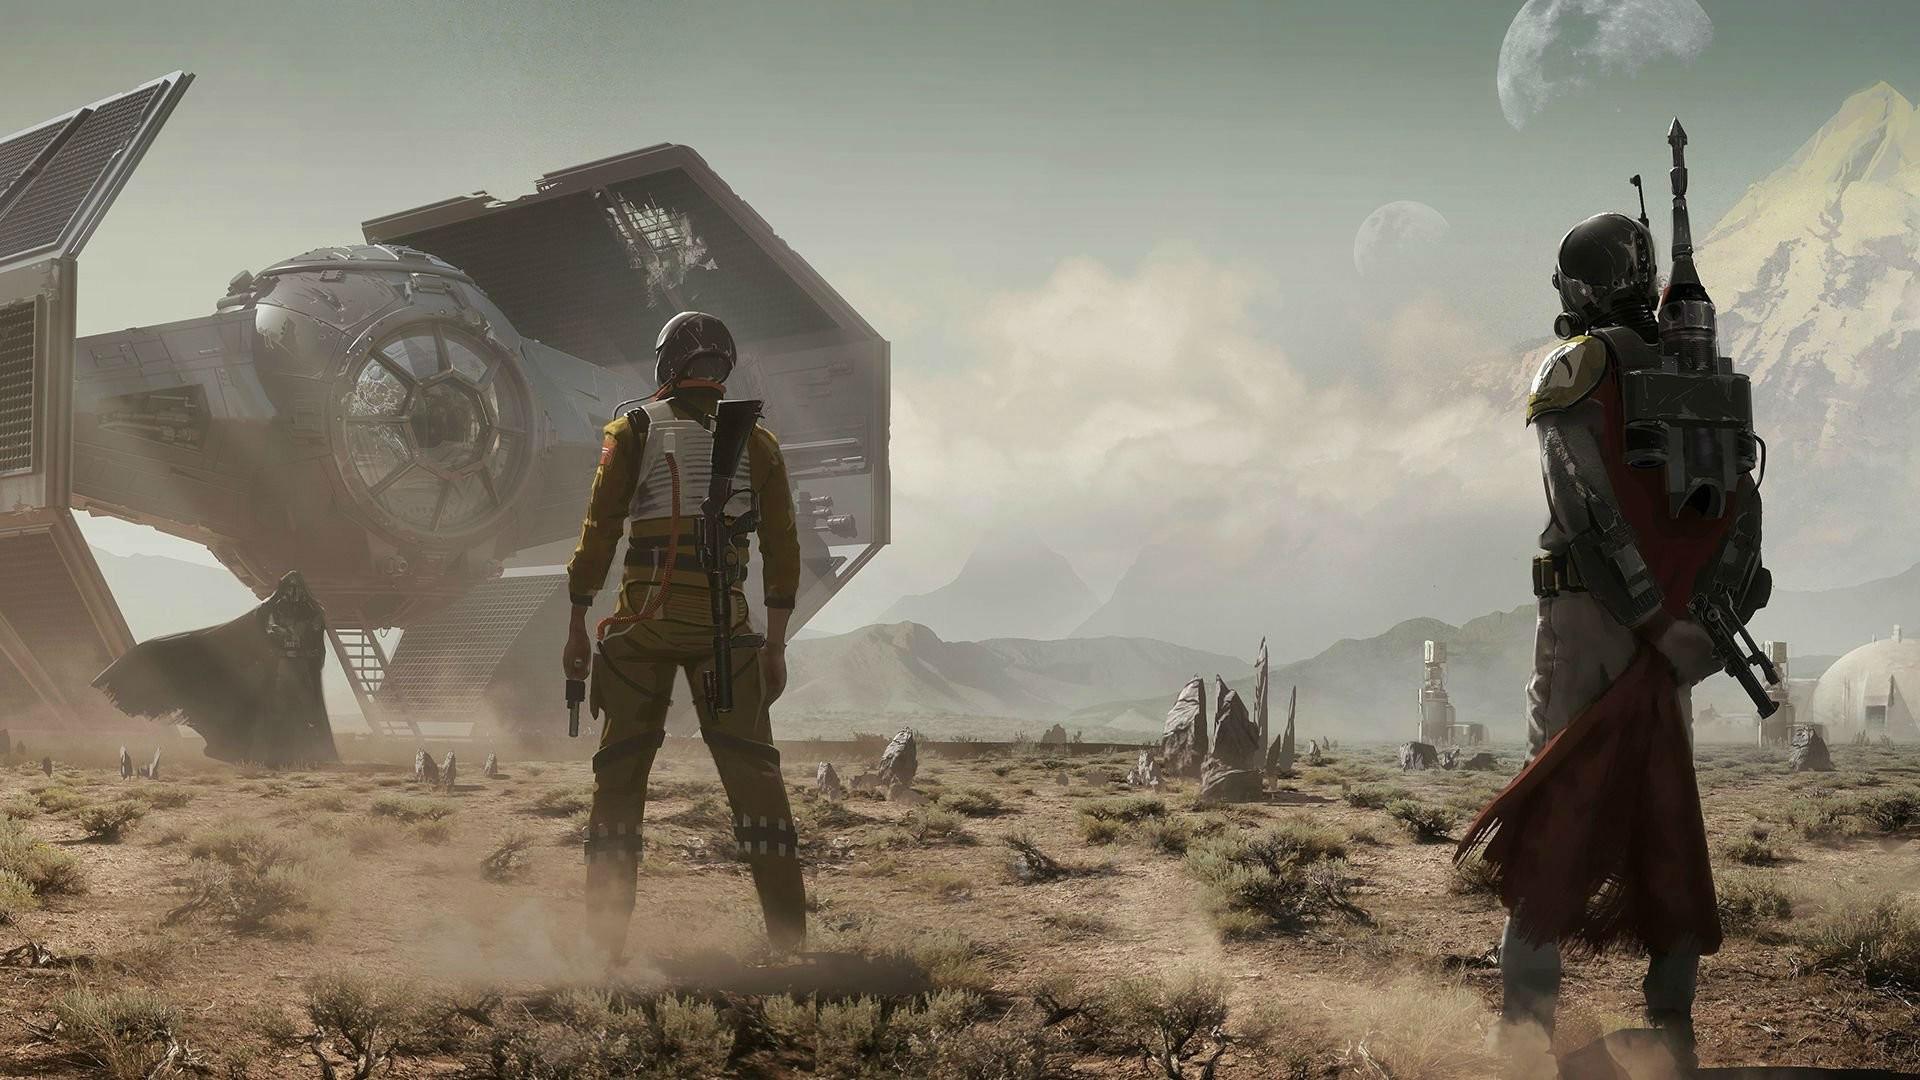 TIE FIGHTER star wars futuristic spaceship space sci-fi wallpaper      811243   WallpaperUP